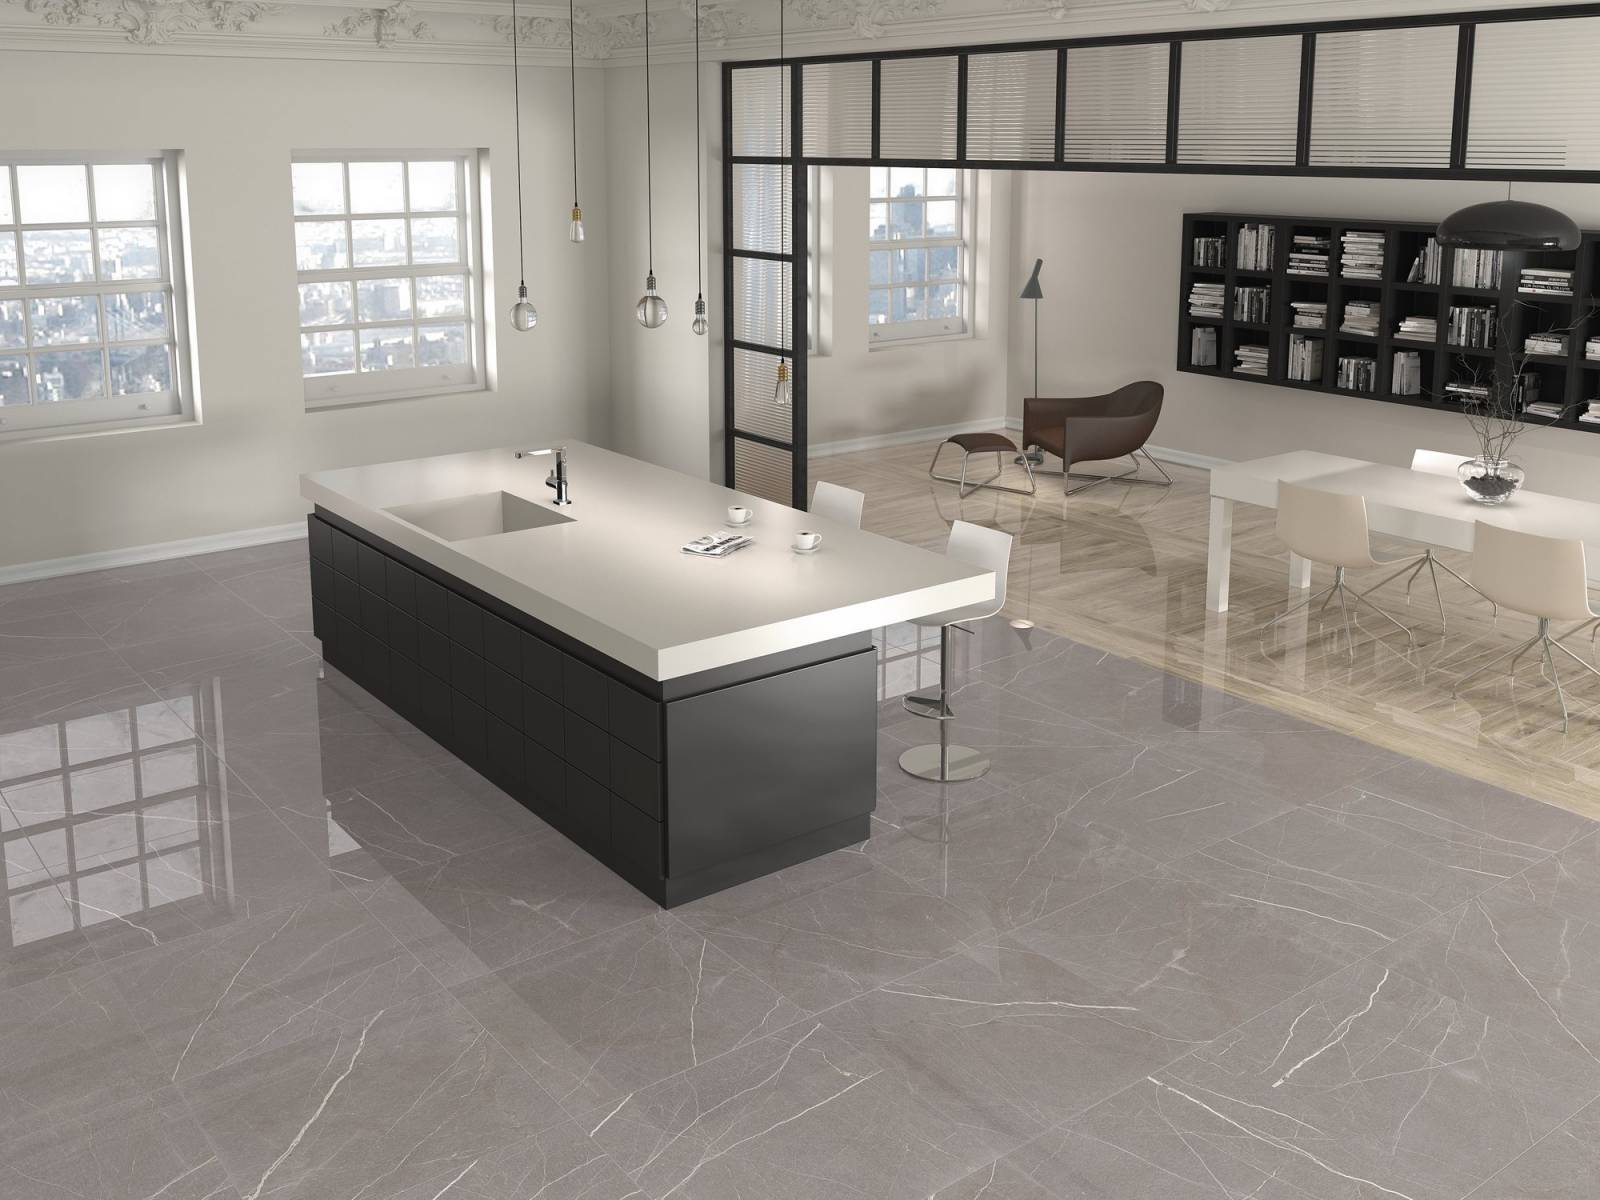 Carrelage Terrazzo Aspect Marbre Effet Miroir Design E32 Vente De